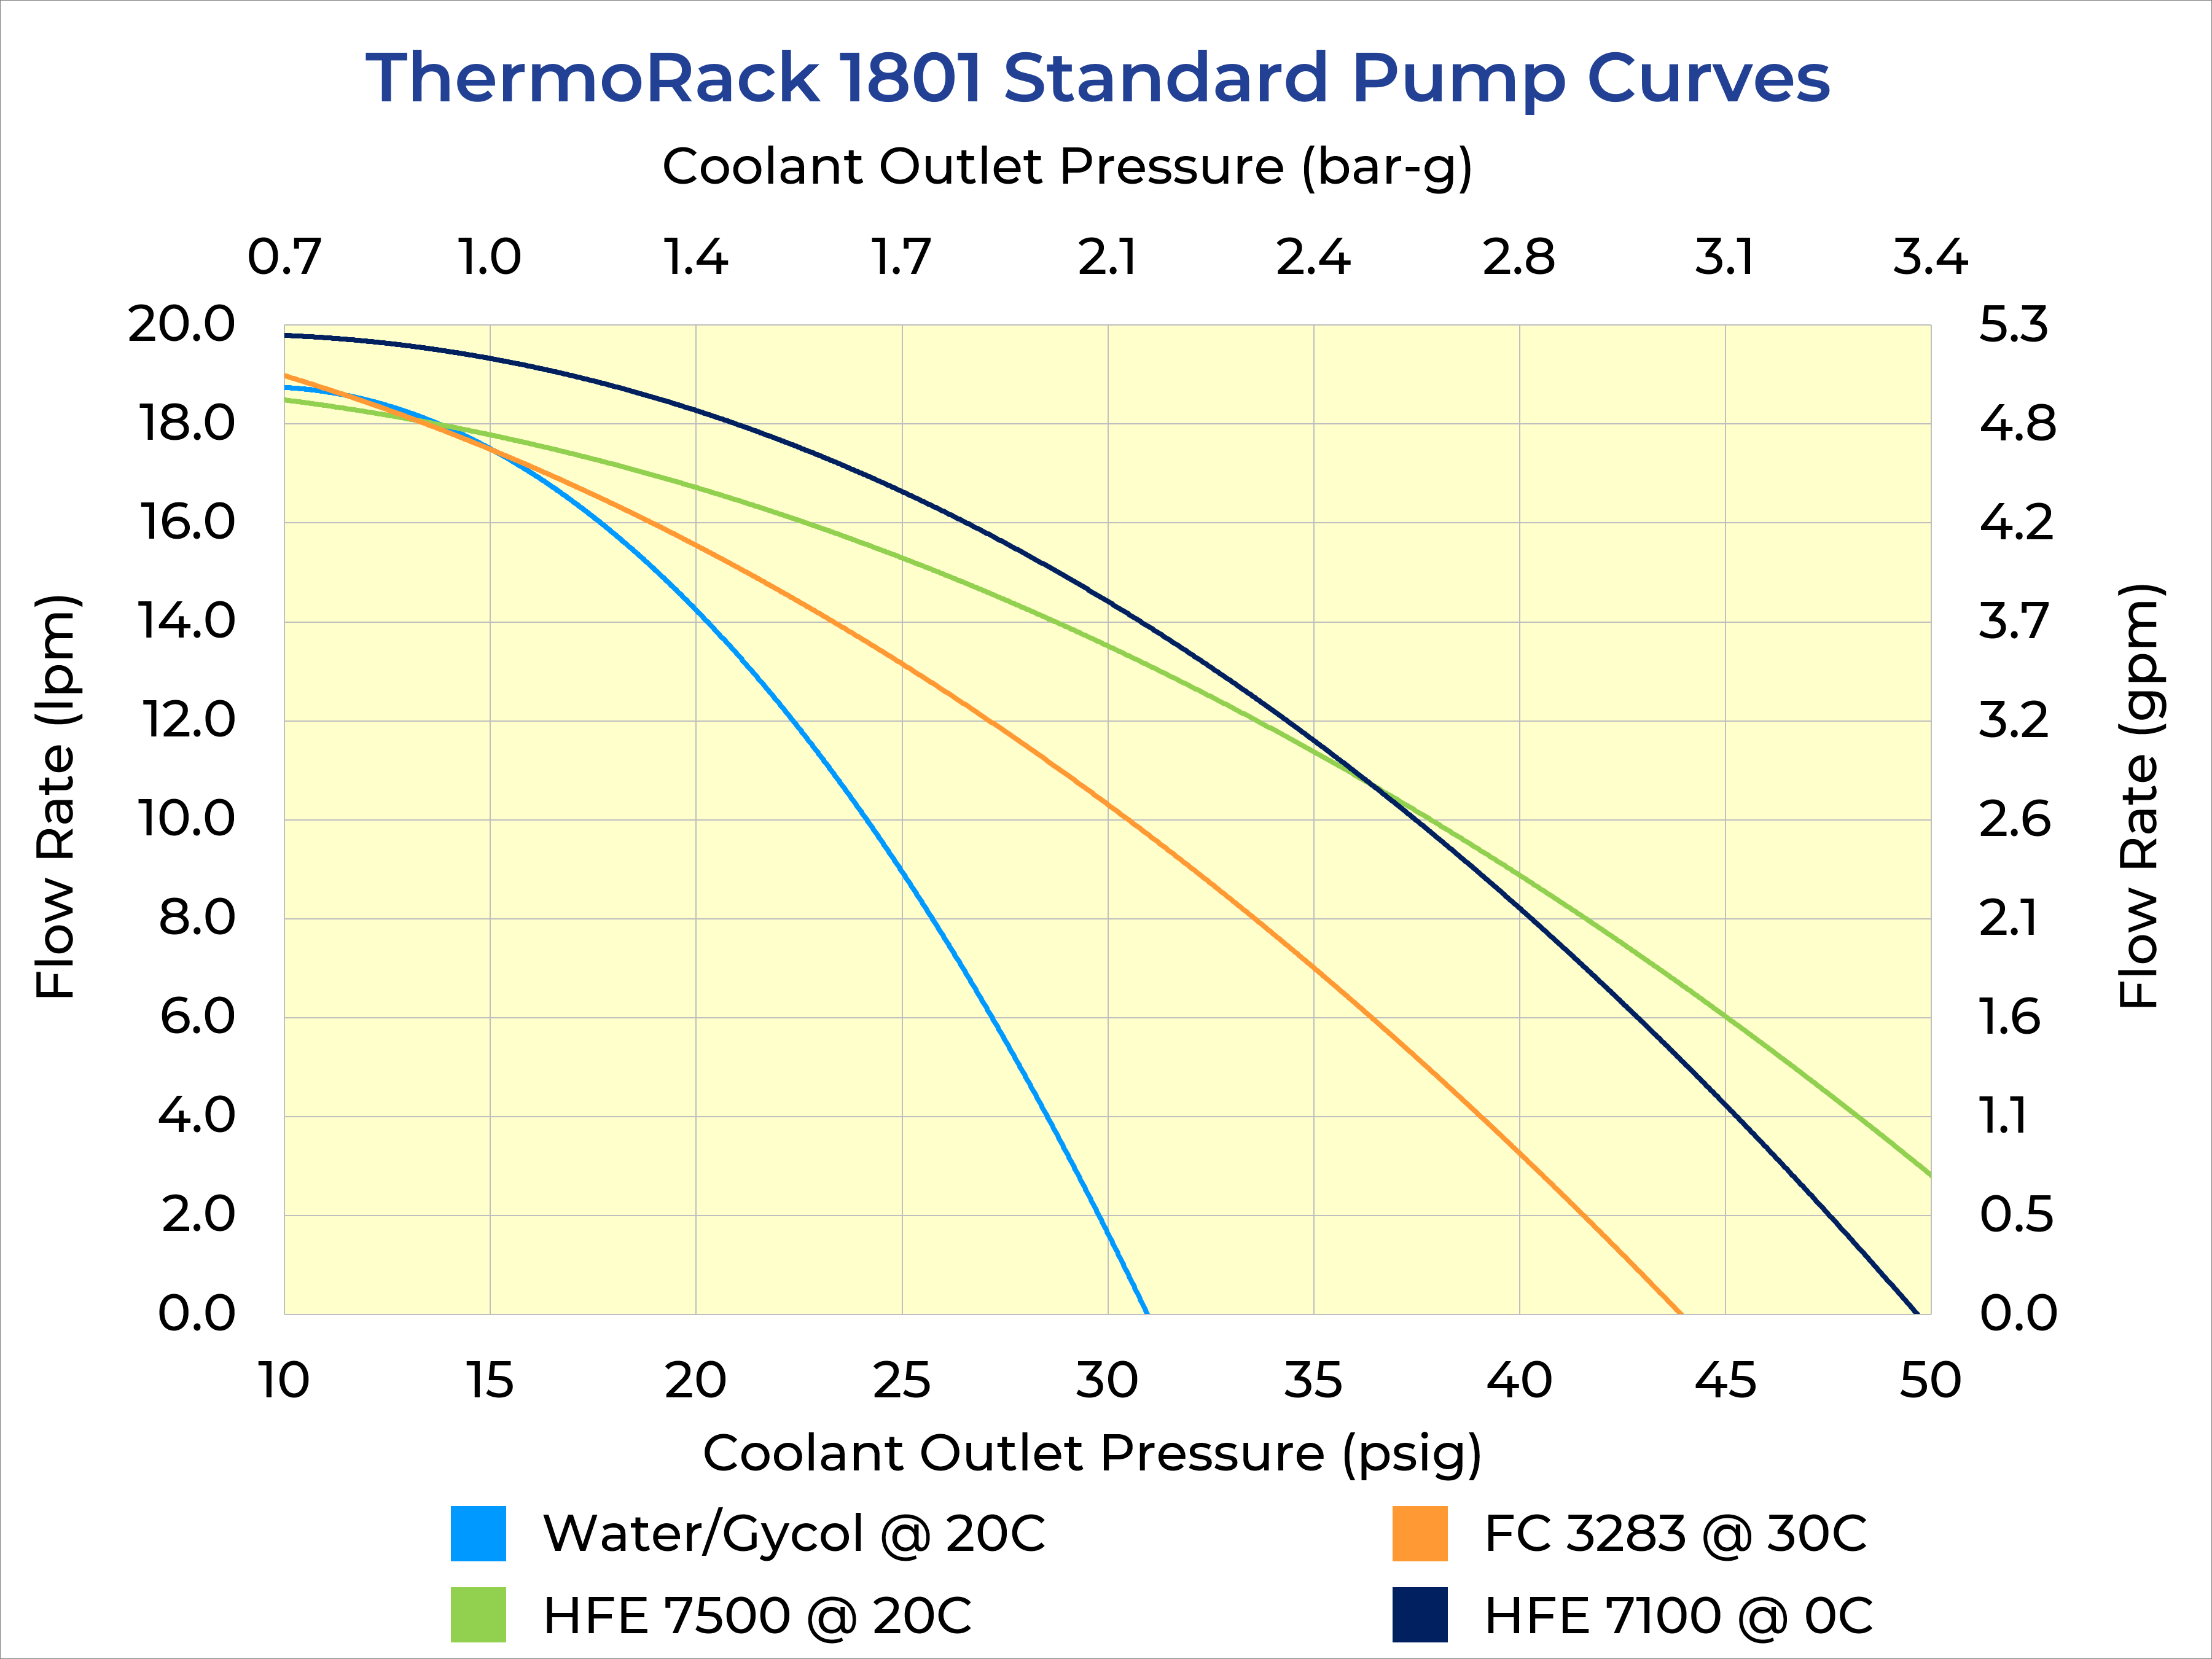 ThermoRack 1801 Pump Curves